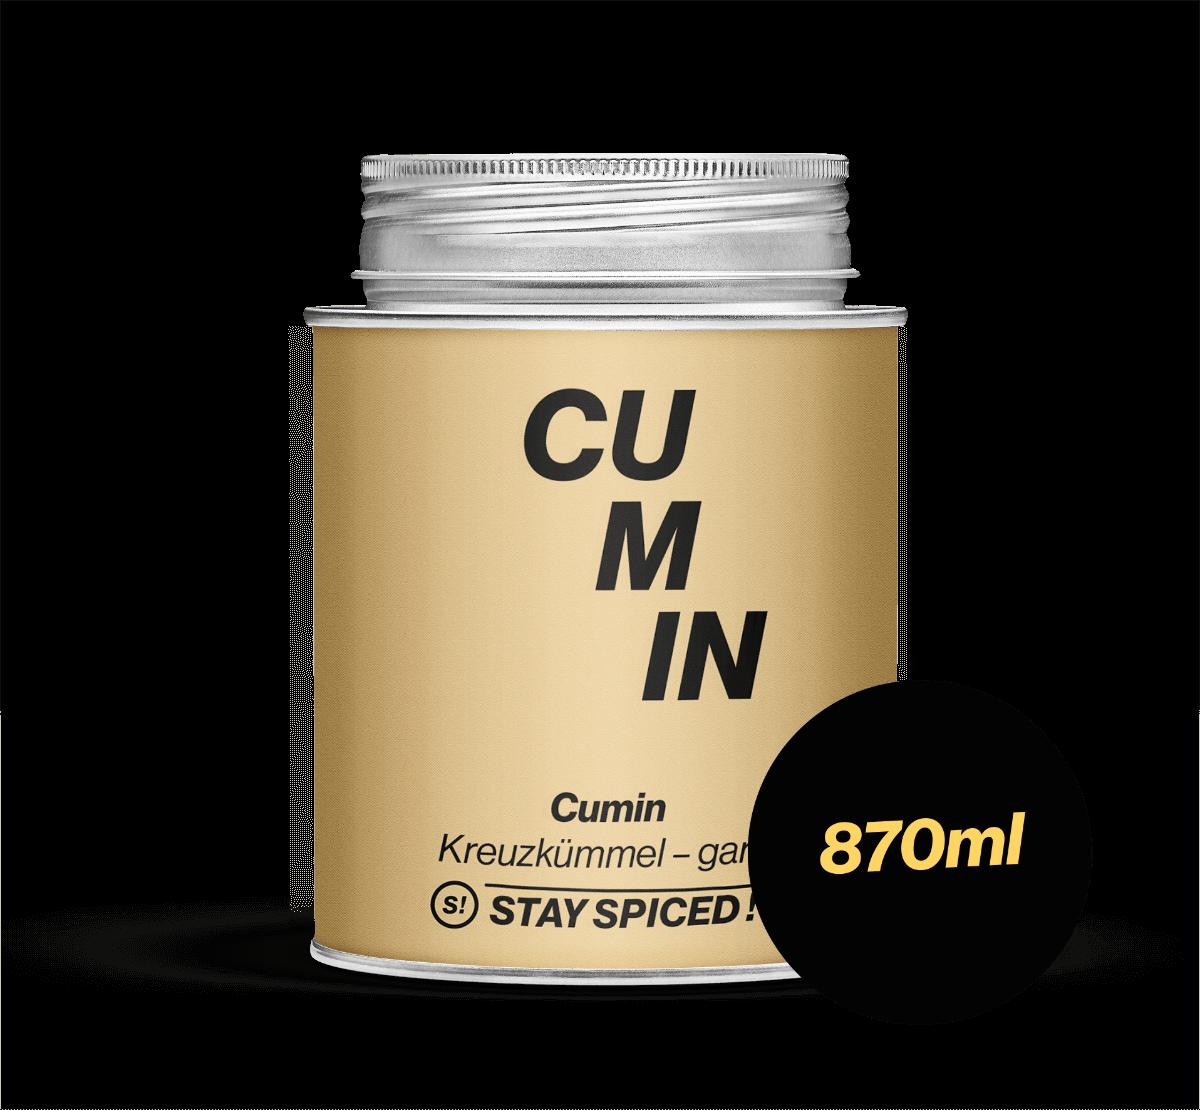 Cumin - Kreuzkümmel - ganz, 870 ml Schraubdose 870ml Schraubdose